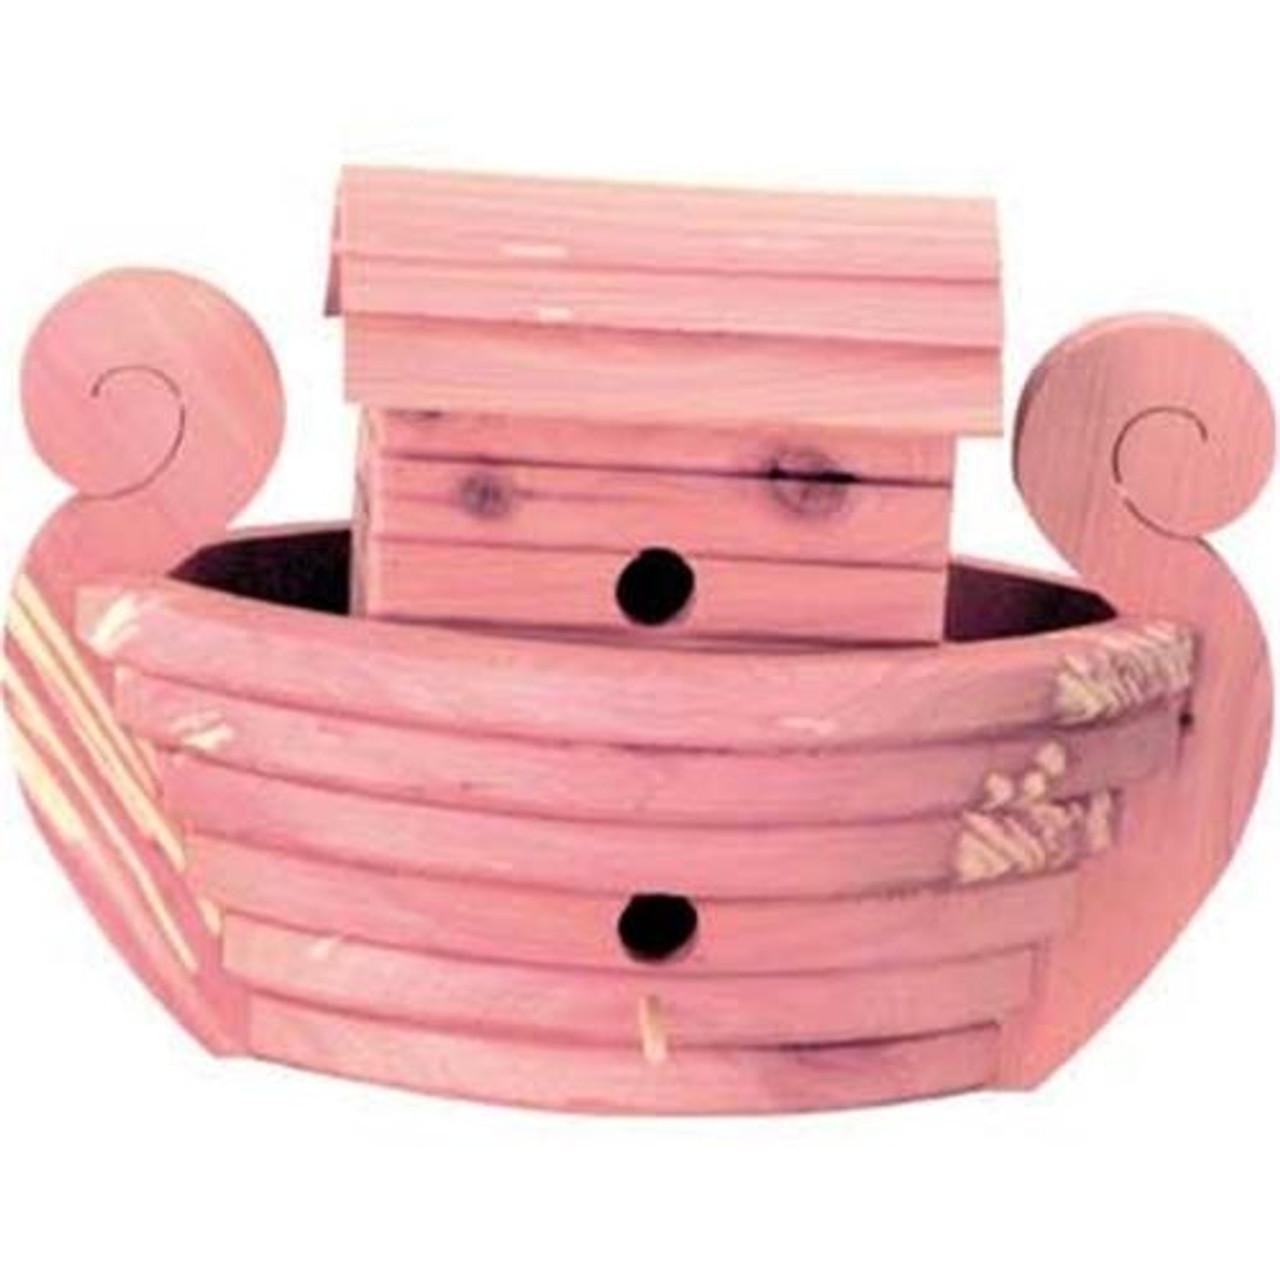 Cherry Tree Toys Noahs Ark Cedar Birdhouse Plan